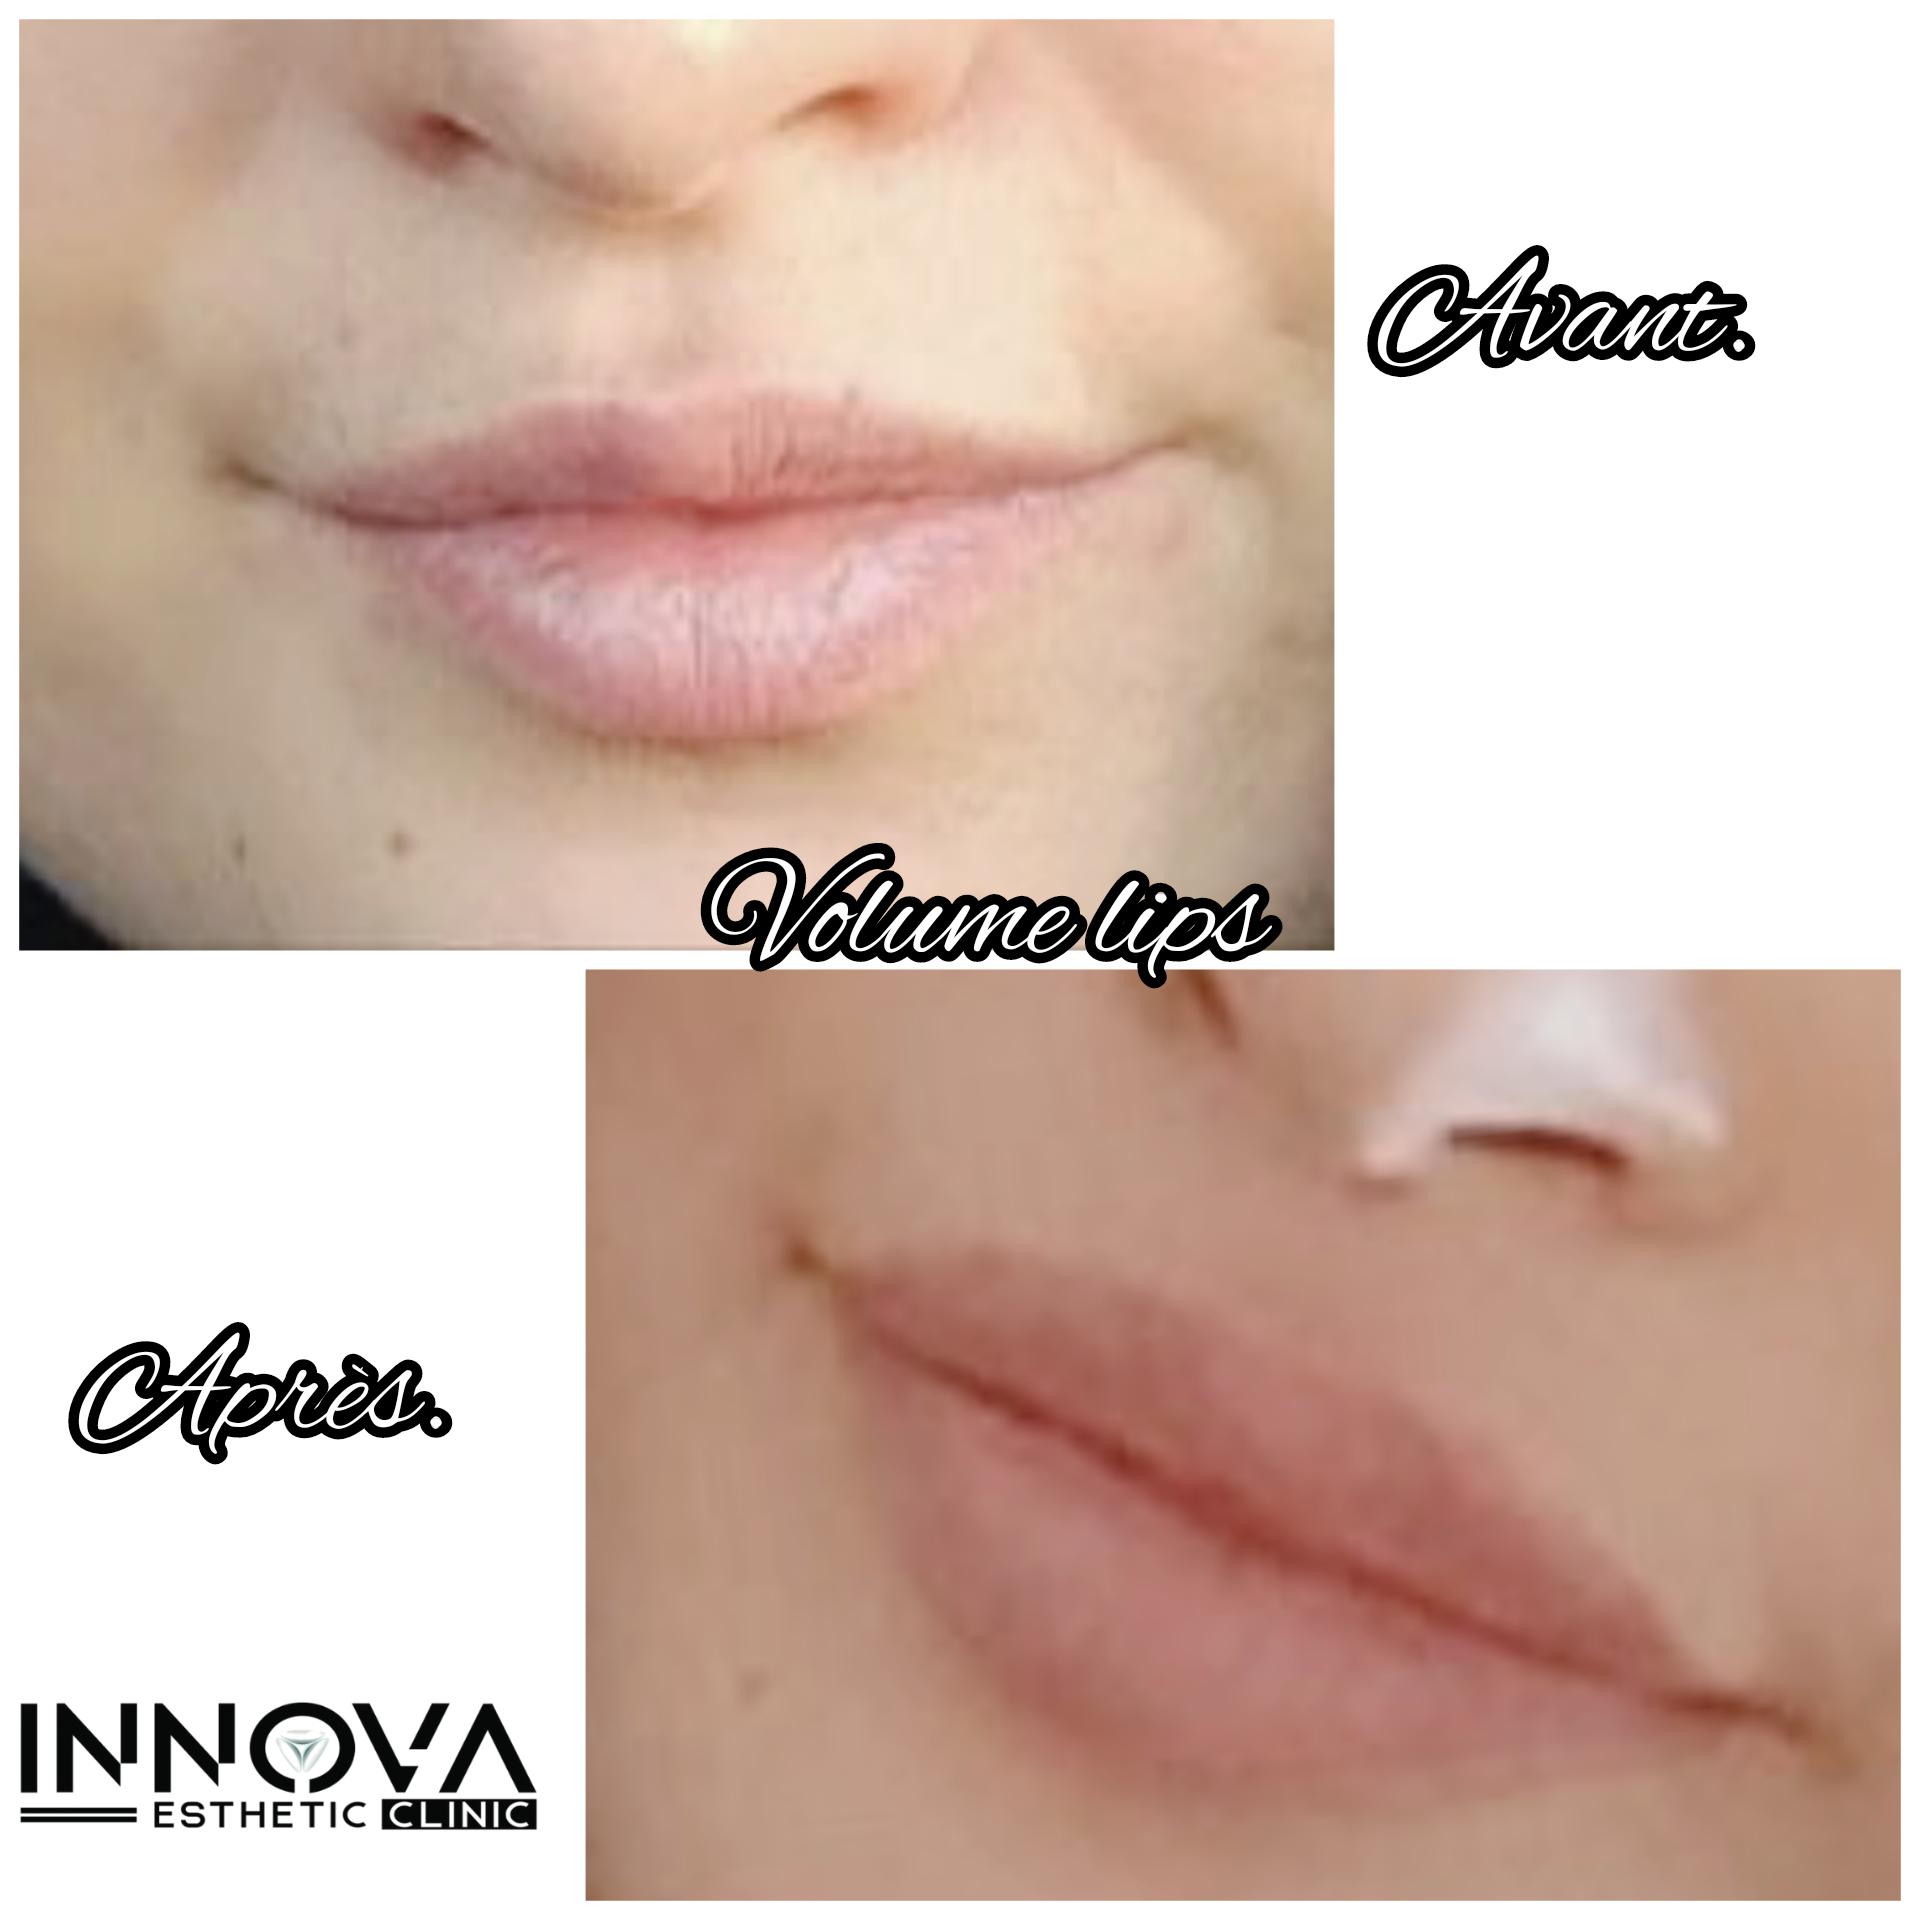 Volume lips